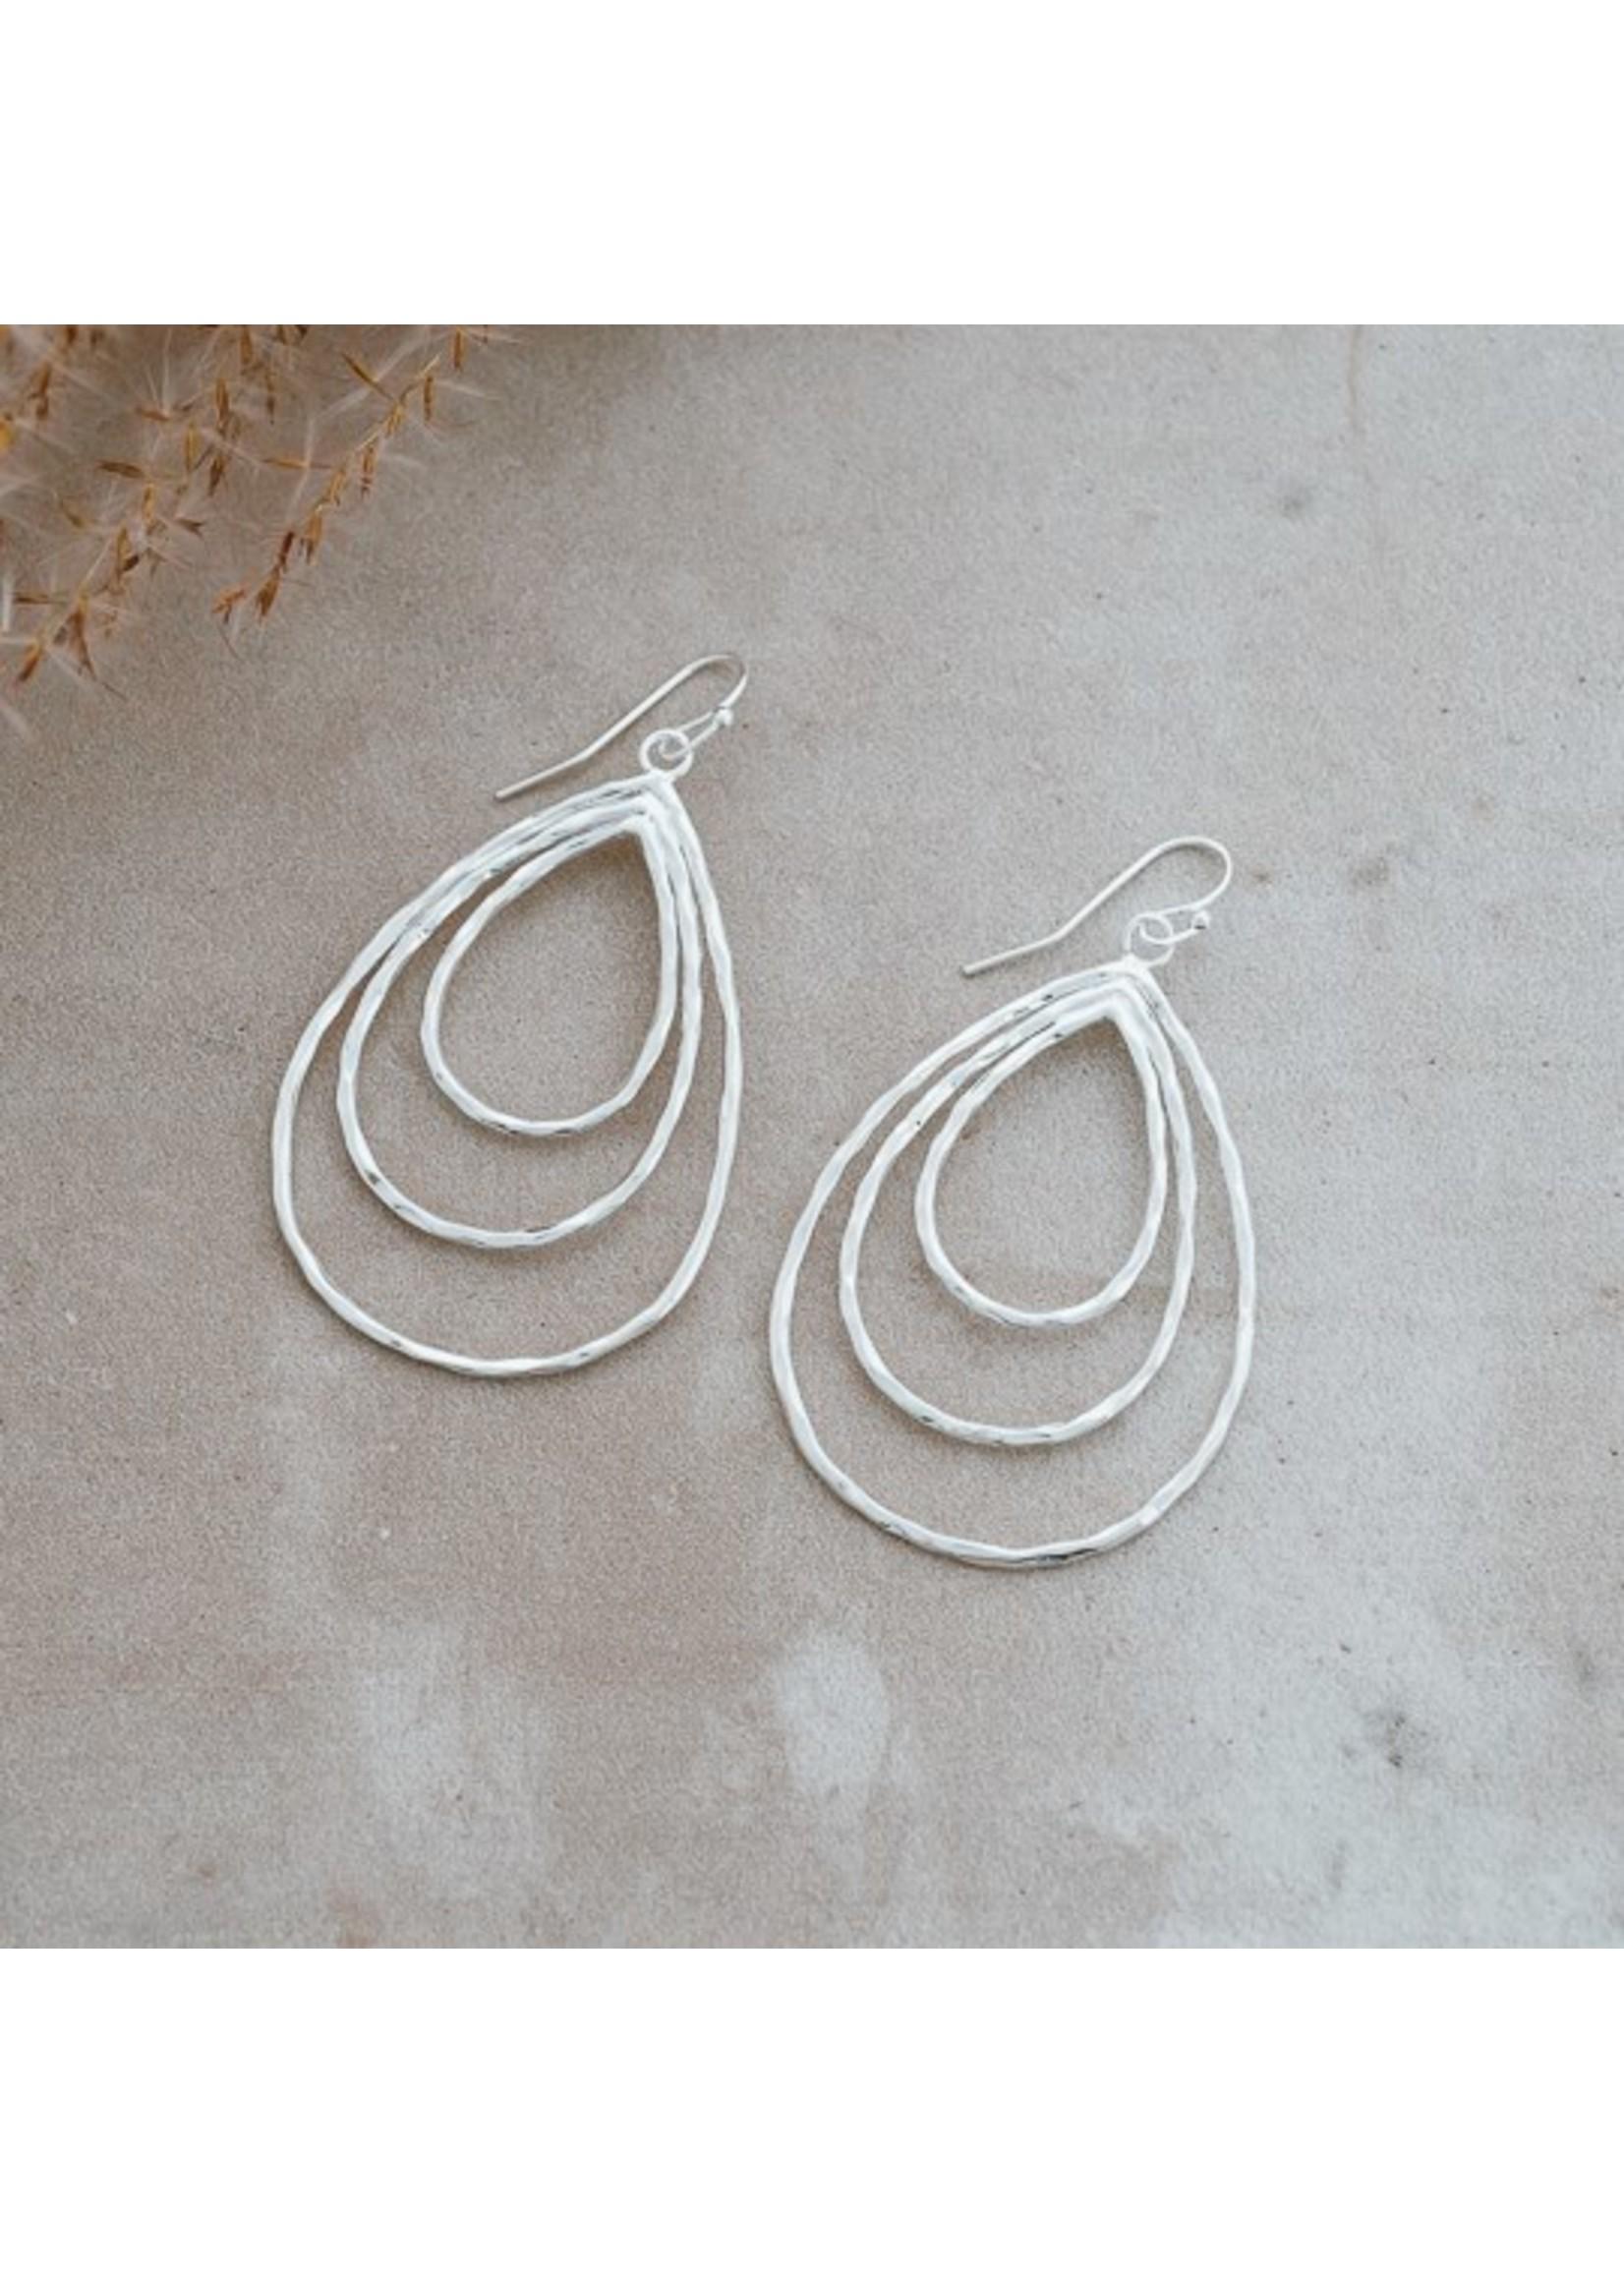 Glee Jewlery Divergence Earrings